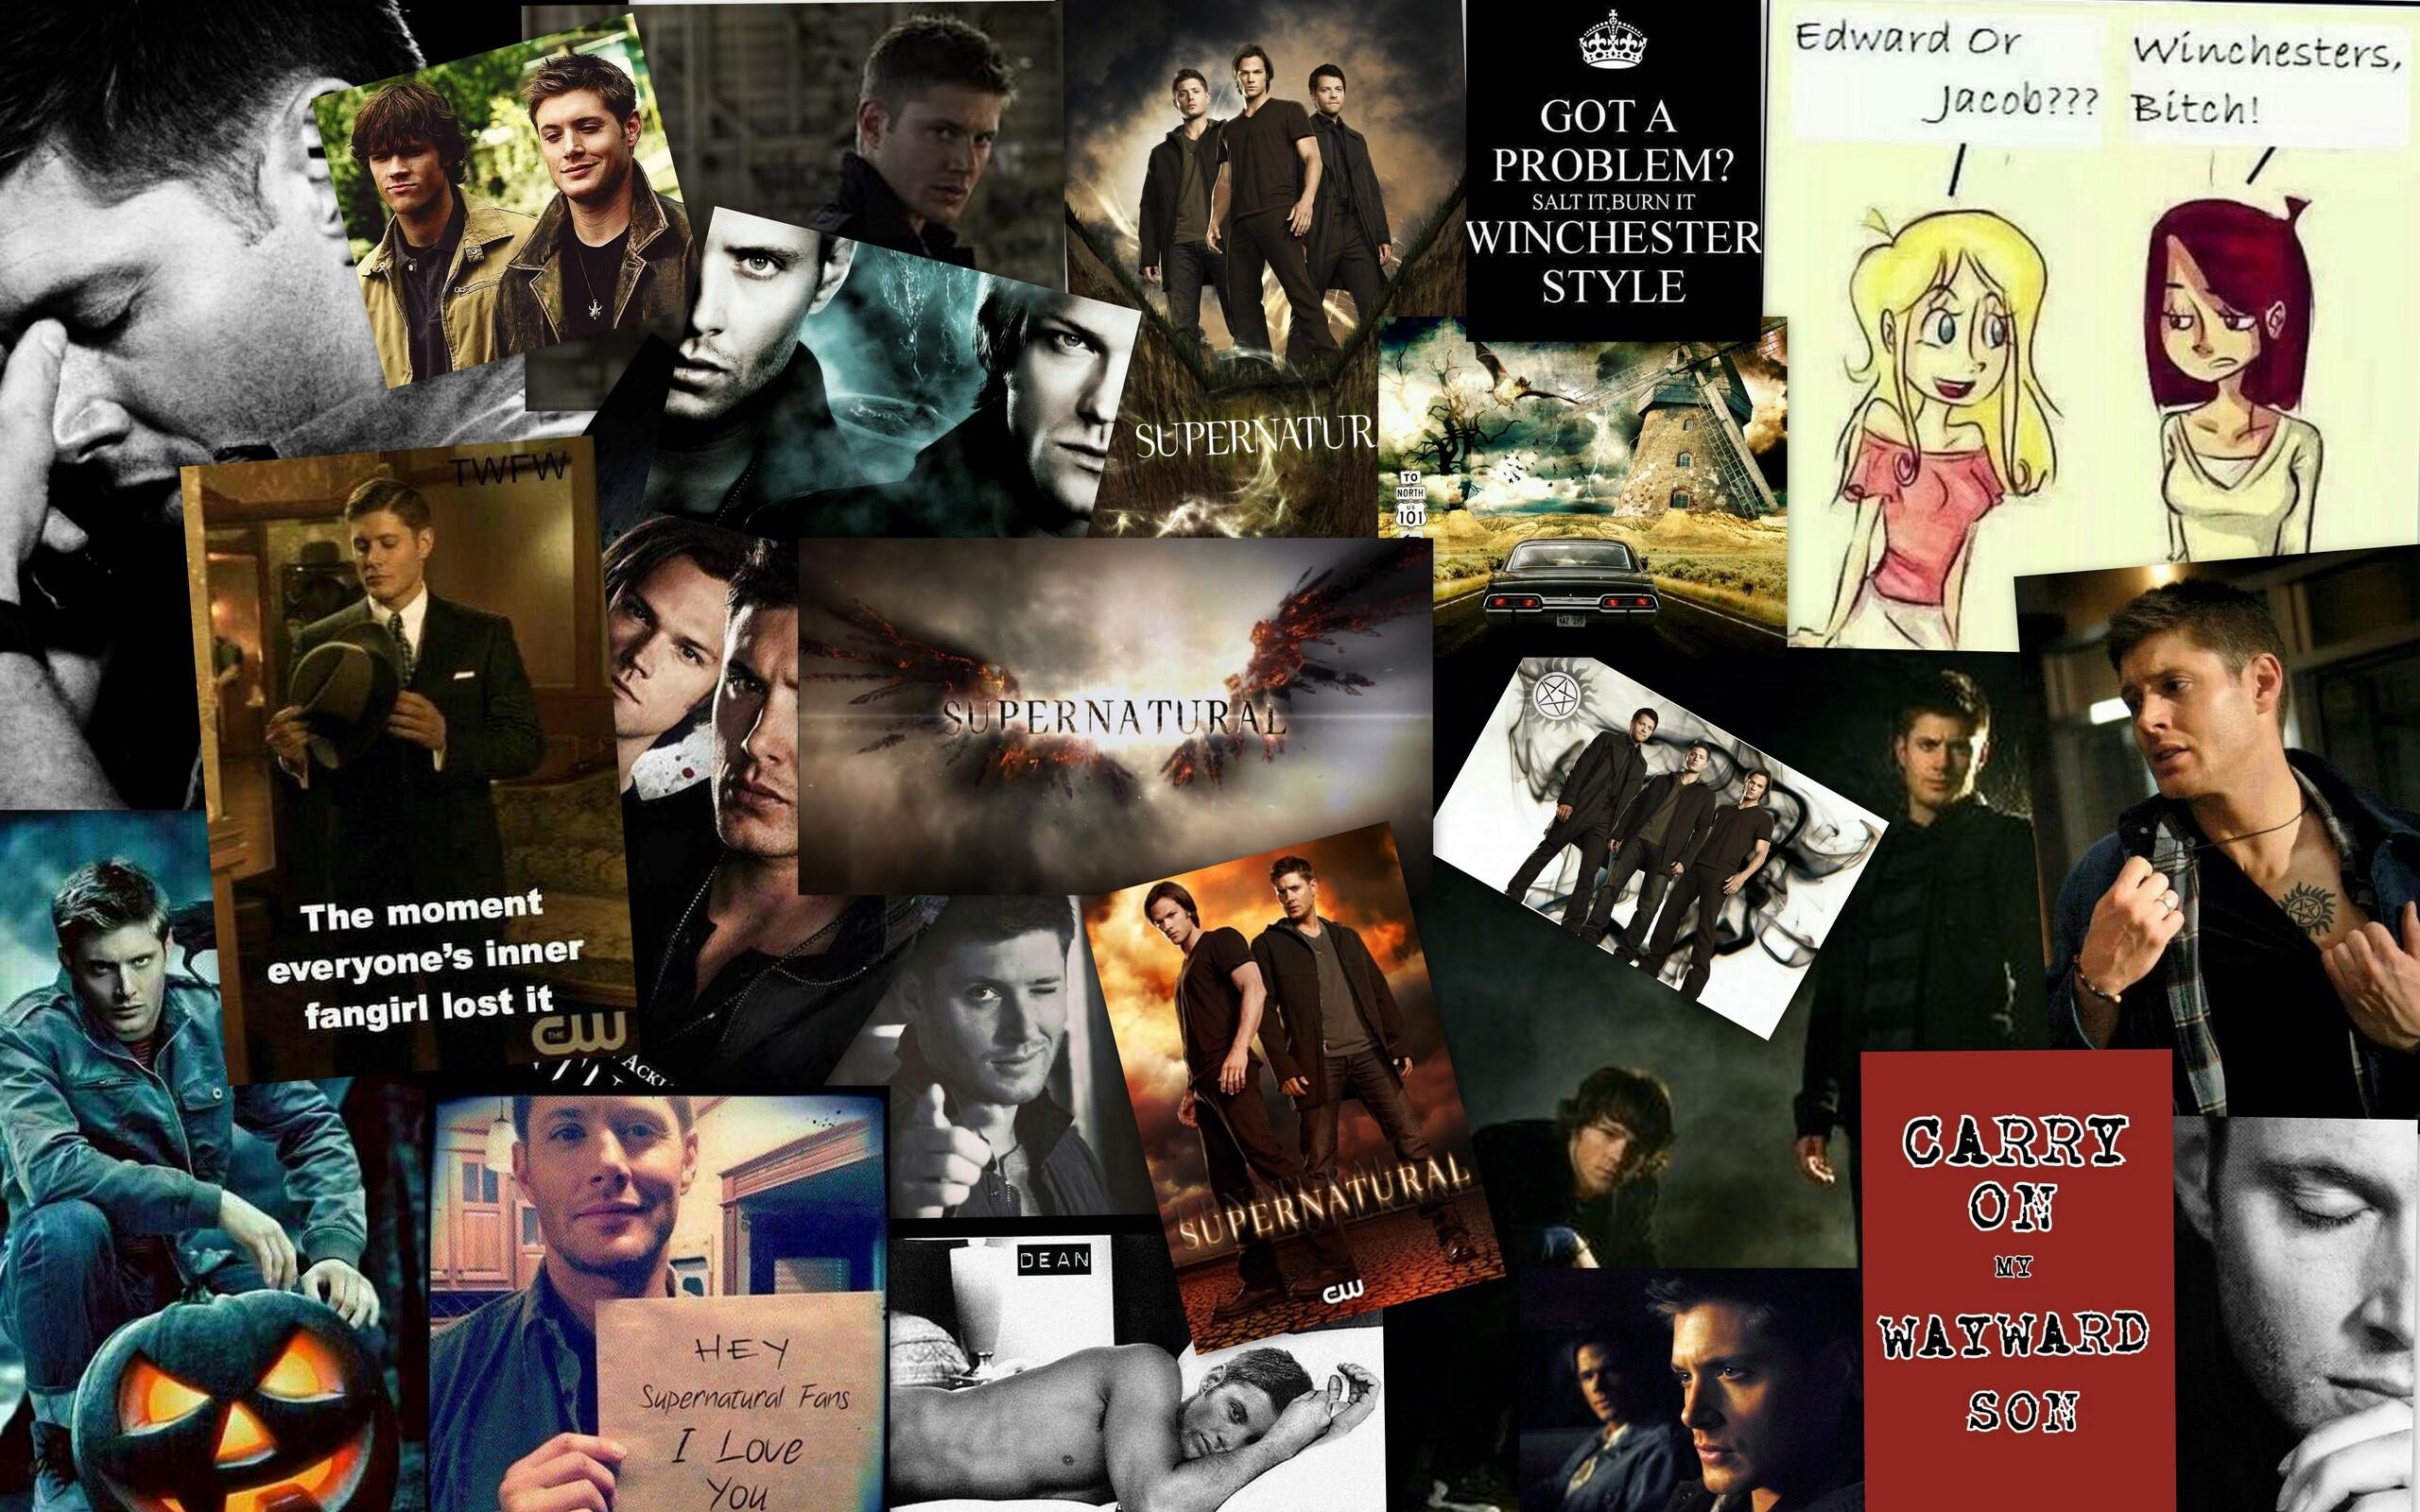 Supernatural Tumblr Collage Image Mag : Supernatural Collage Shauna Granger from imagemag.ru size 5120 x 3200 jpeg 2571kB